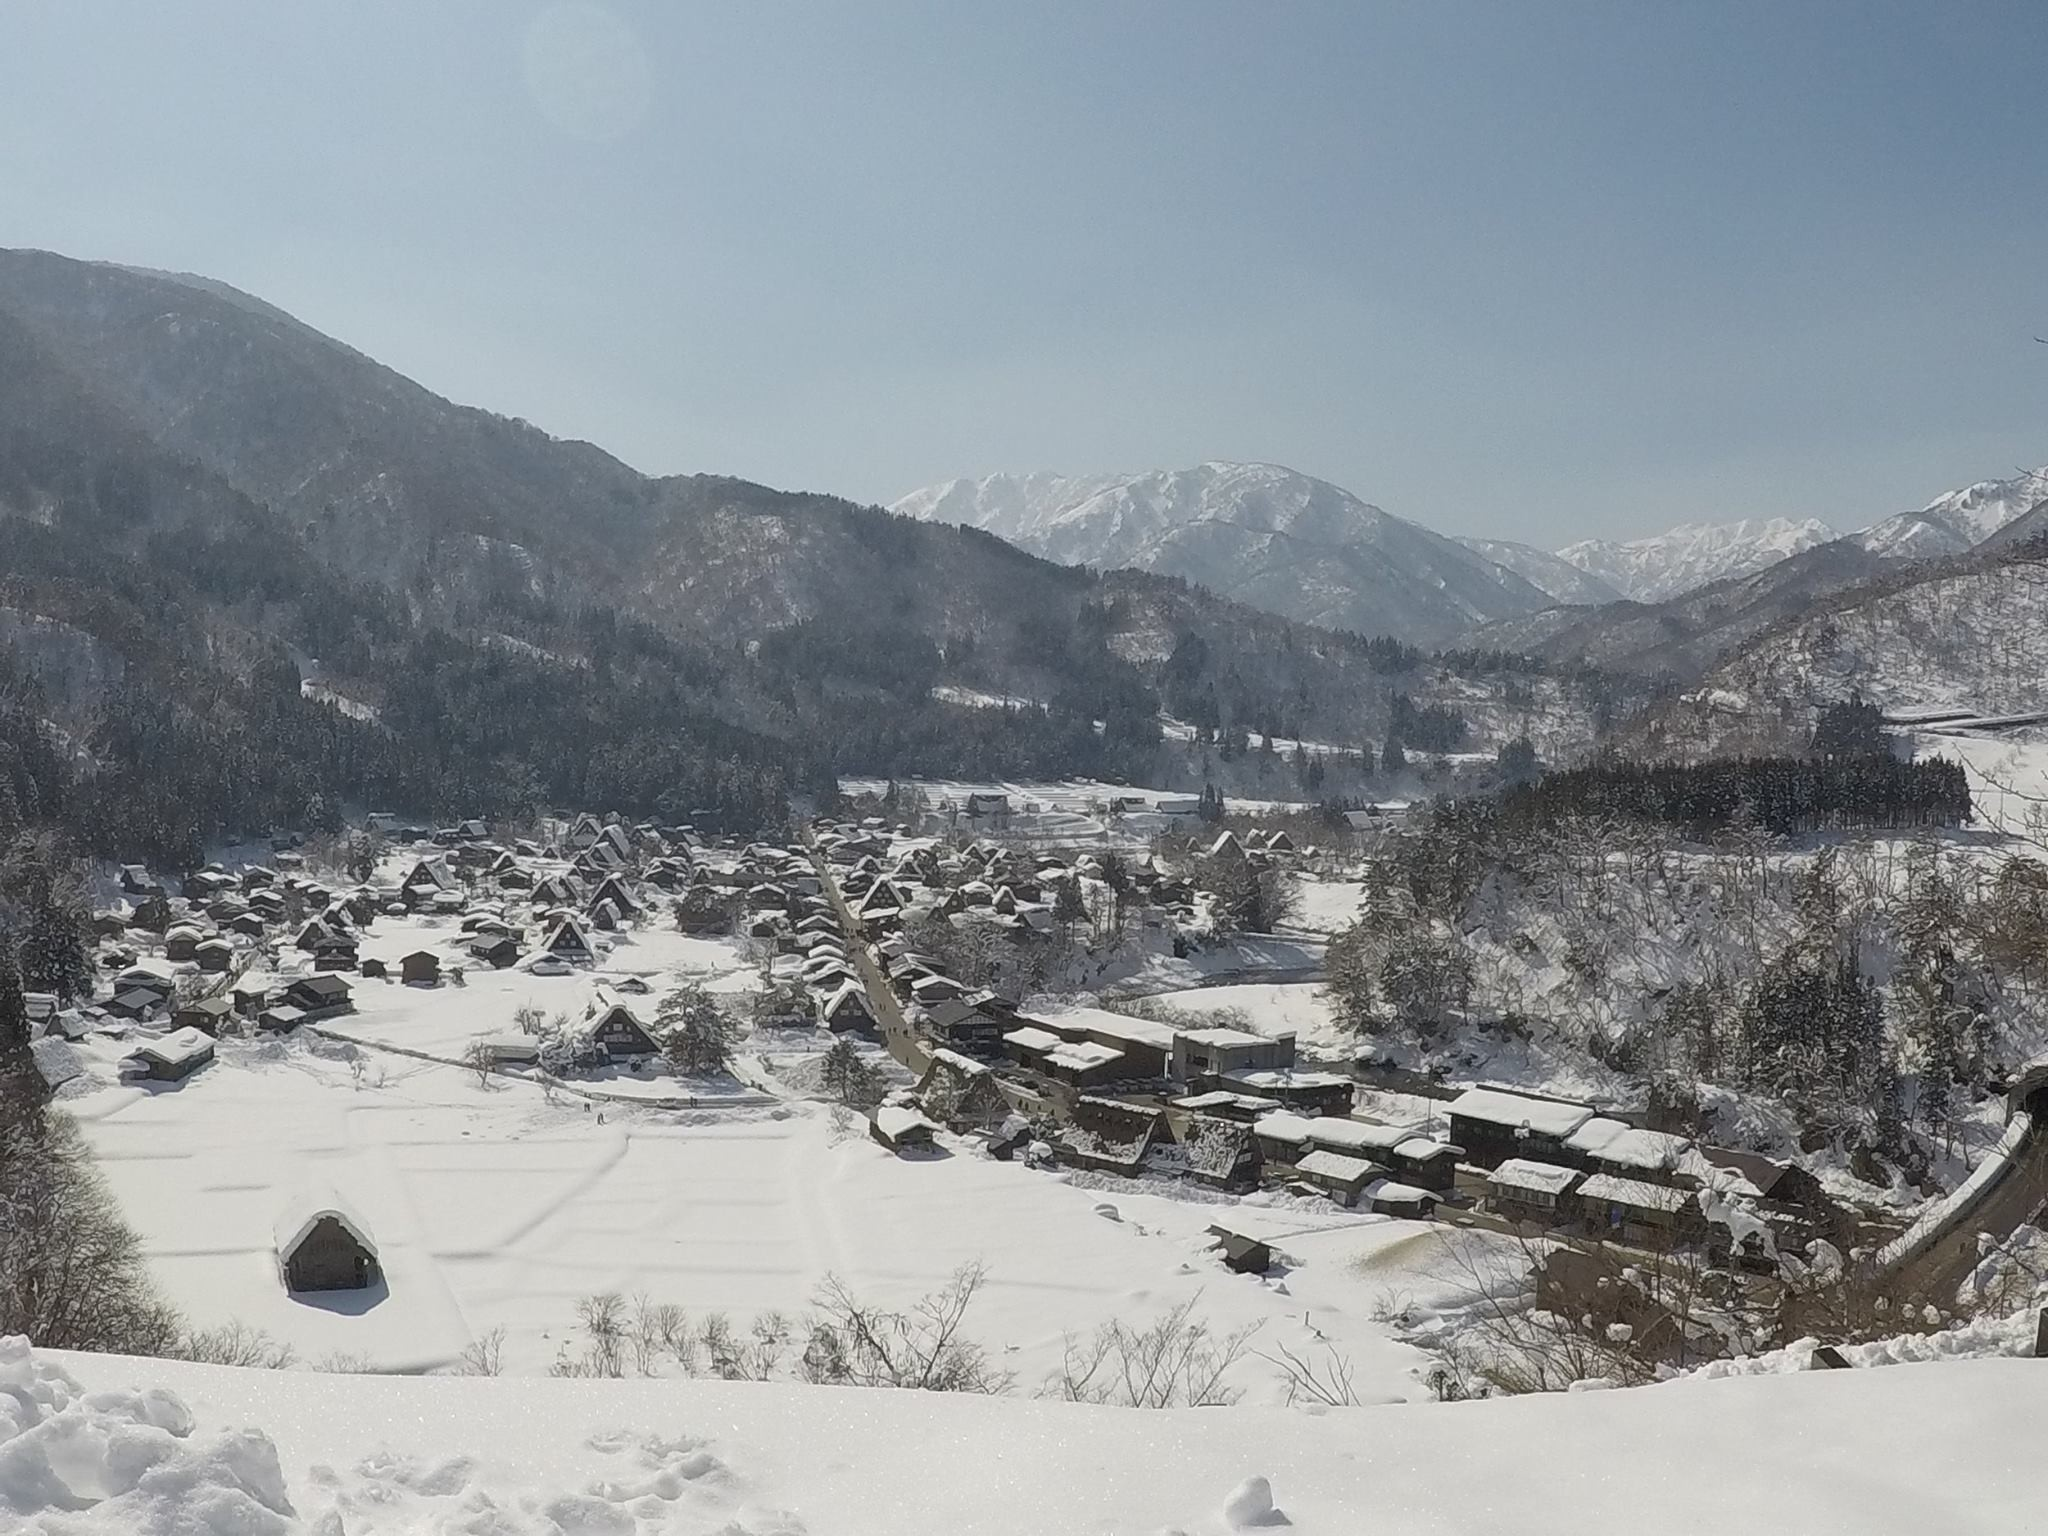 Shirakawa-go Village by Bus